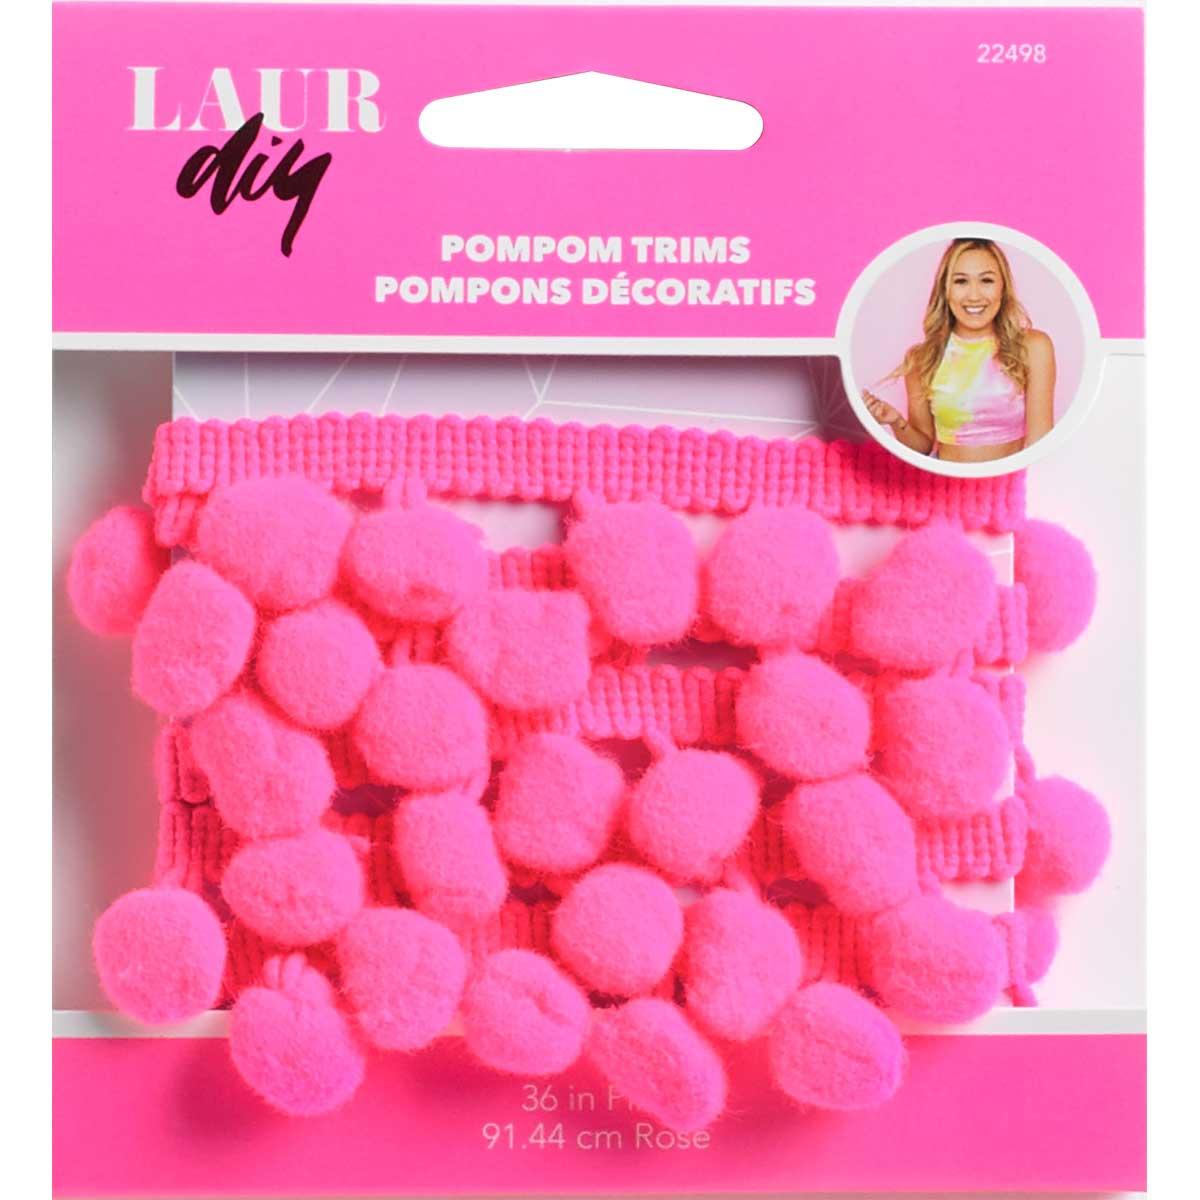 LaurDIY ® Pompom Trims - Pink